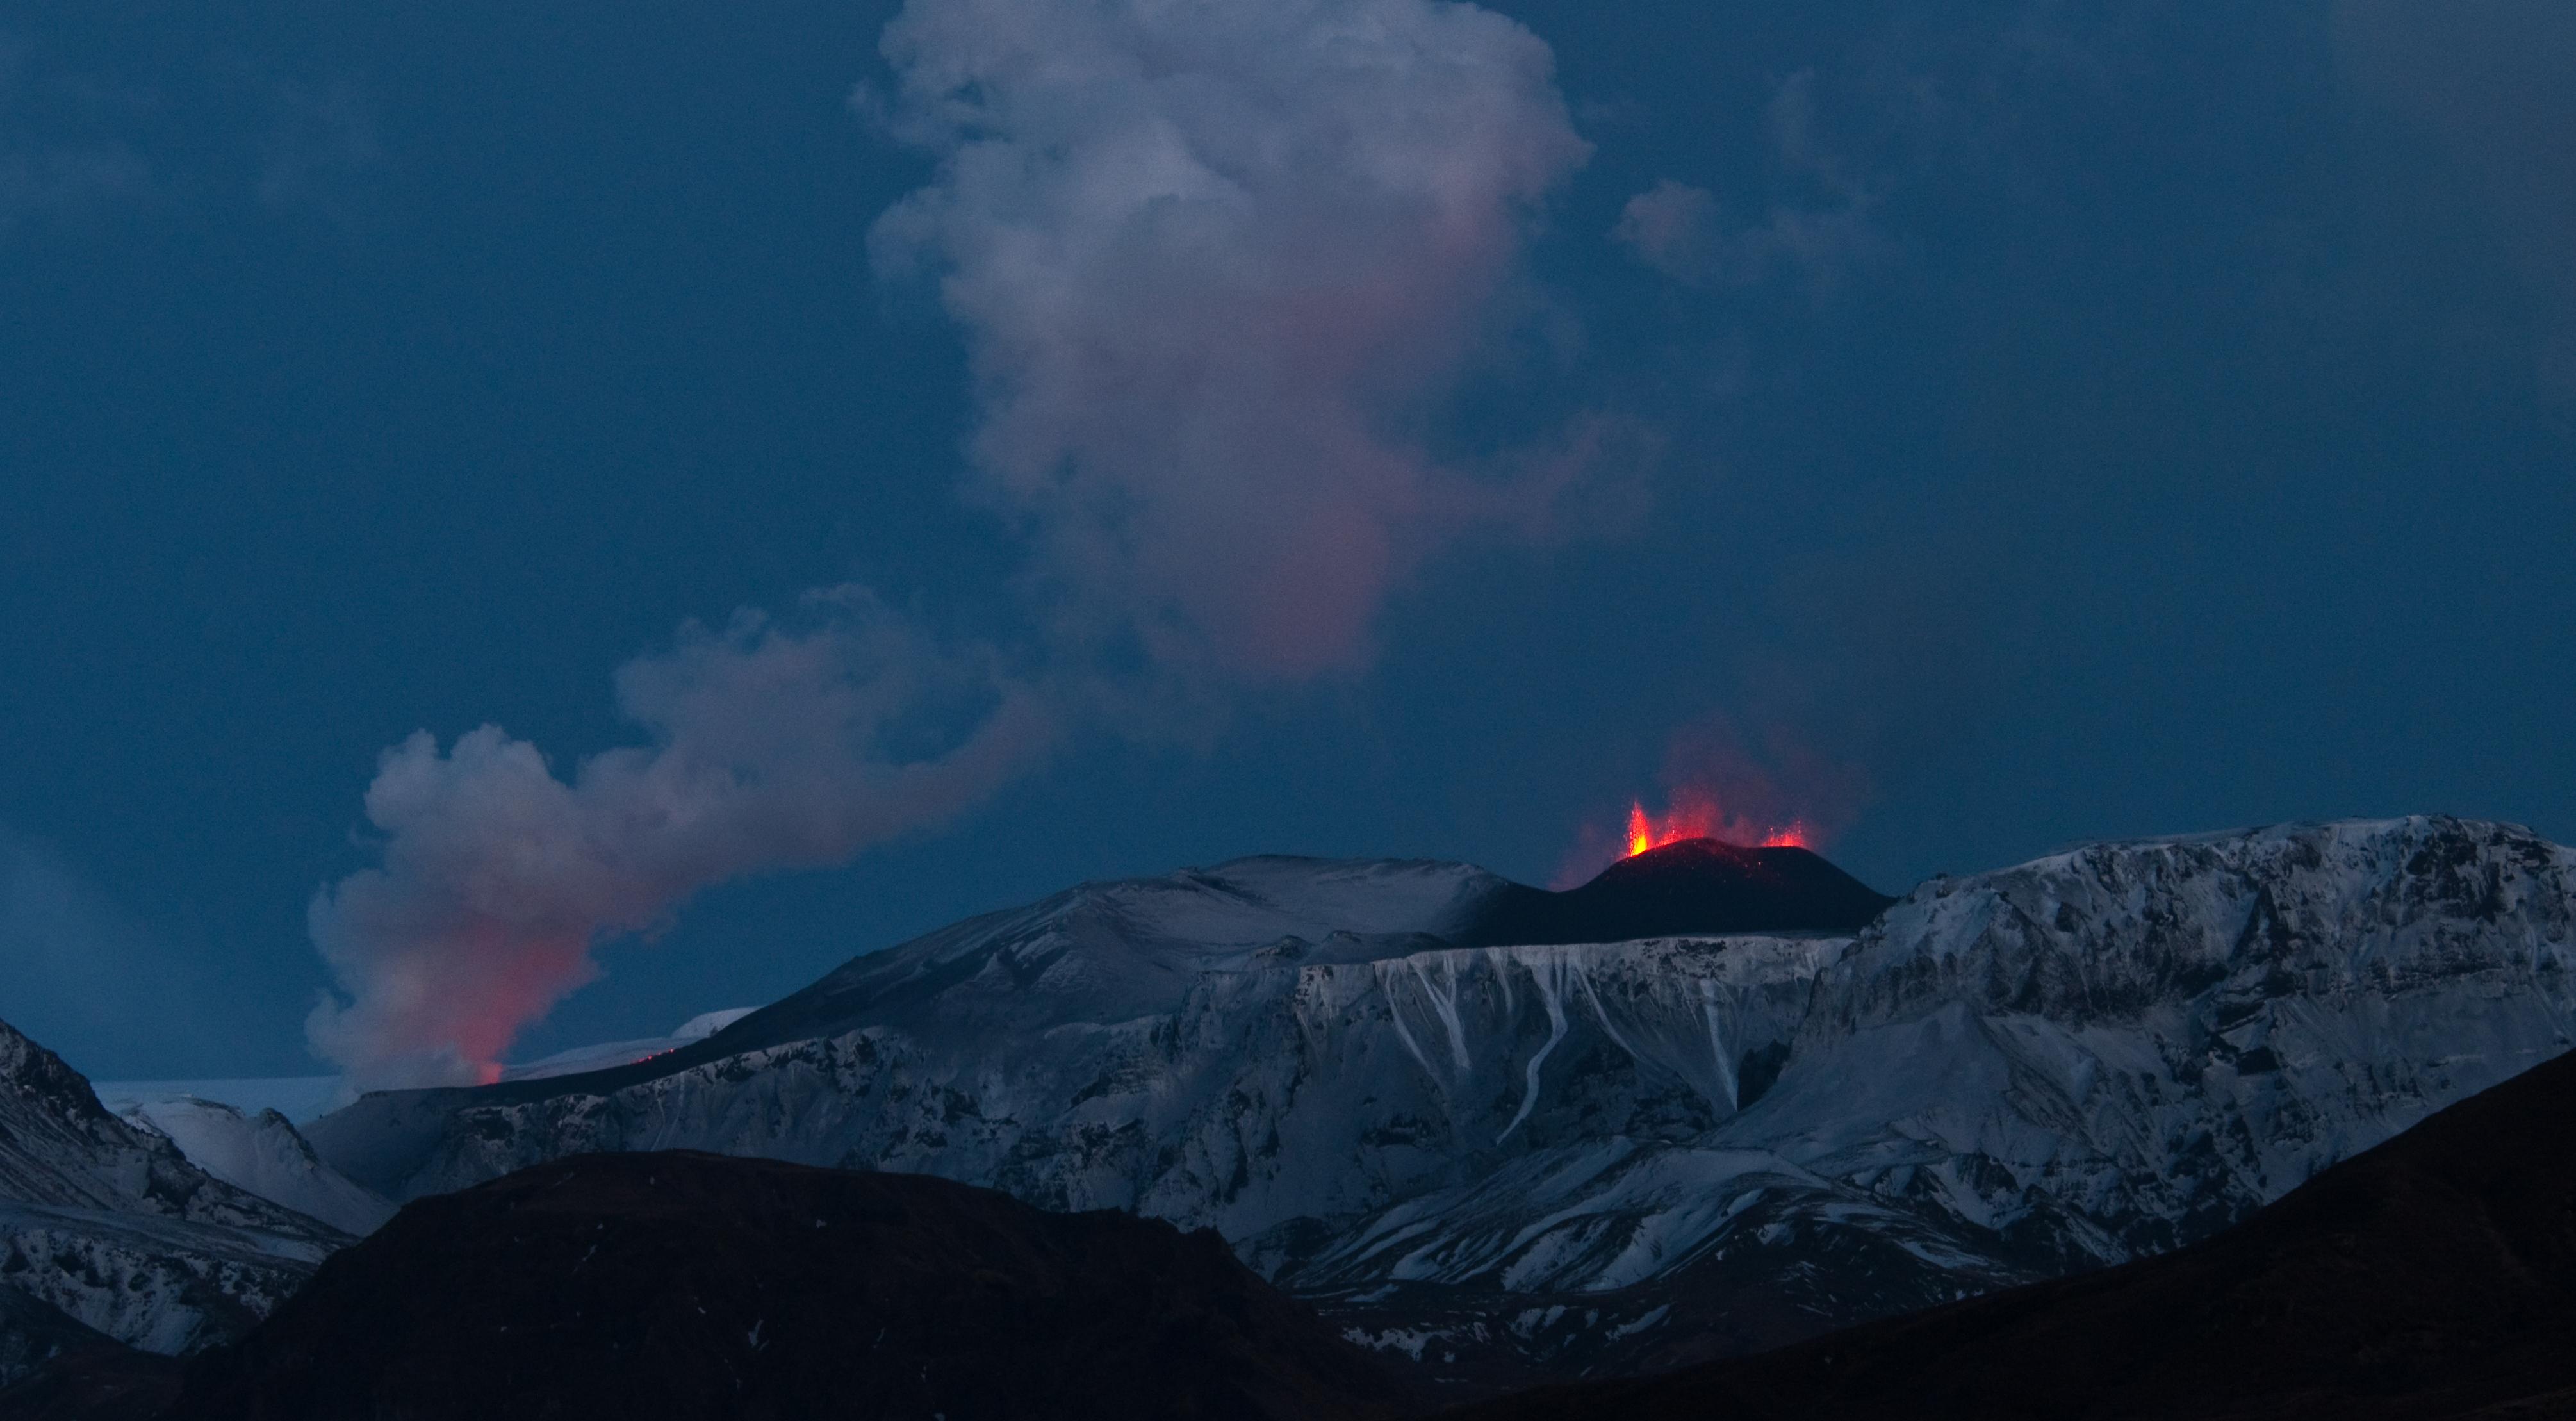 Eyjafjallaj%C3%B6kull_eruption_Fimmv%C3%B6r%C3%B0uh%C3%A1ls_crater_20100325.jpg